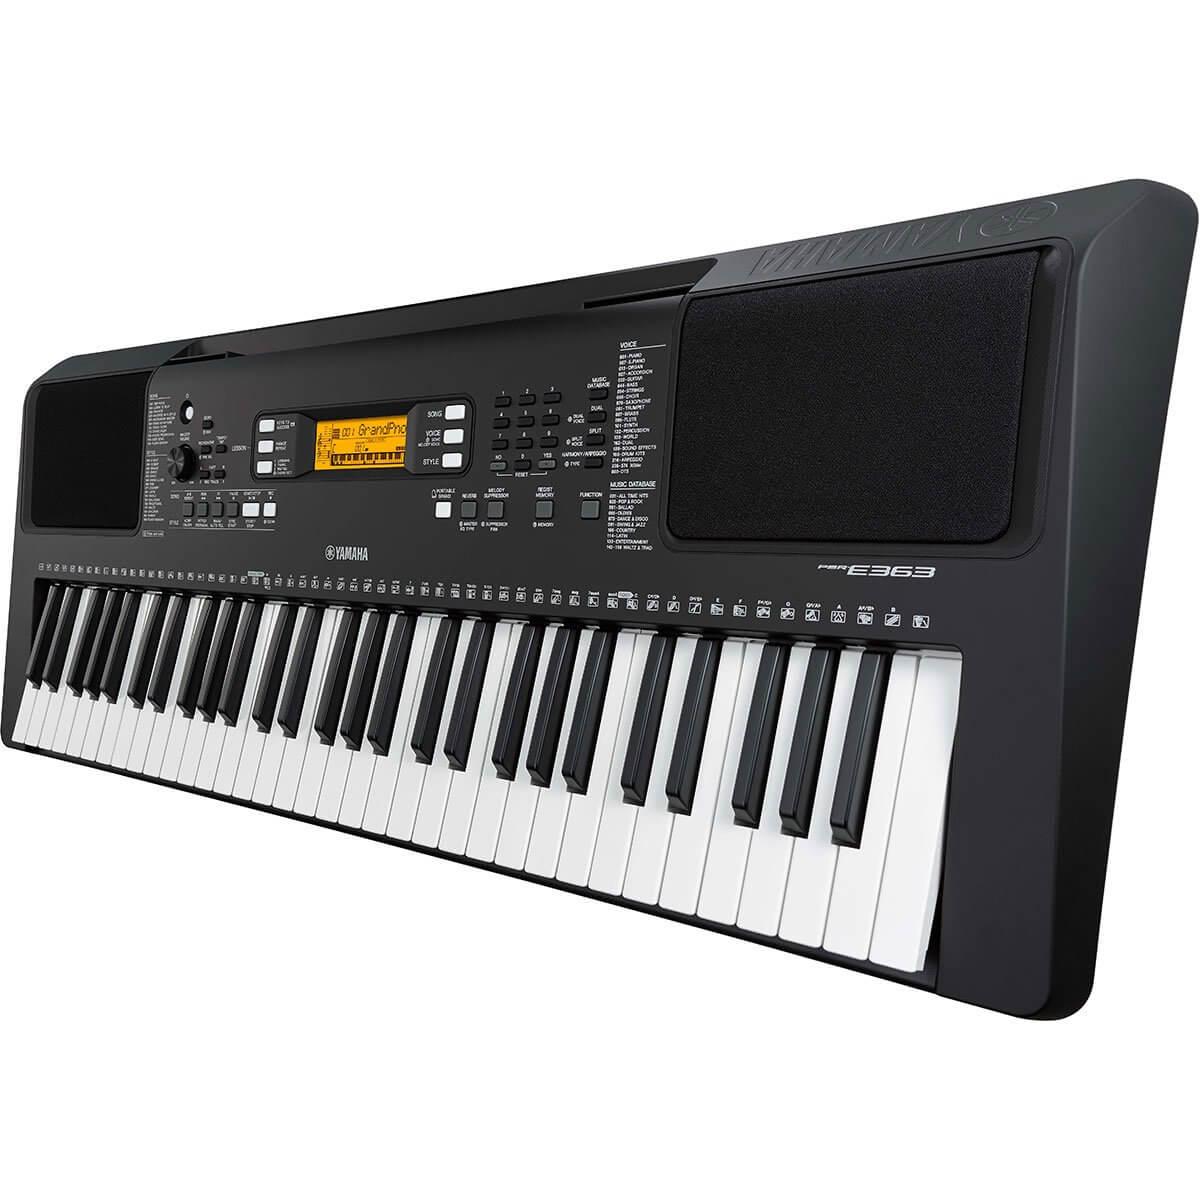 yamaha psr e363 61 key portable digital keyboard music machine musical instruments nz. Black Bedroom Furniture Sets. Home Design Ideas